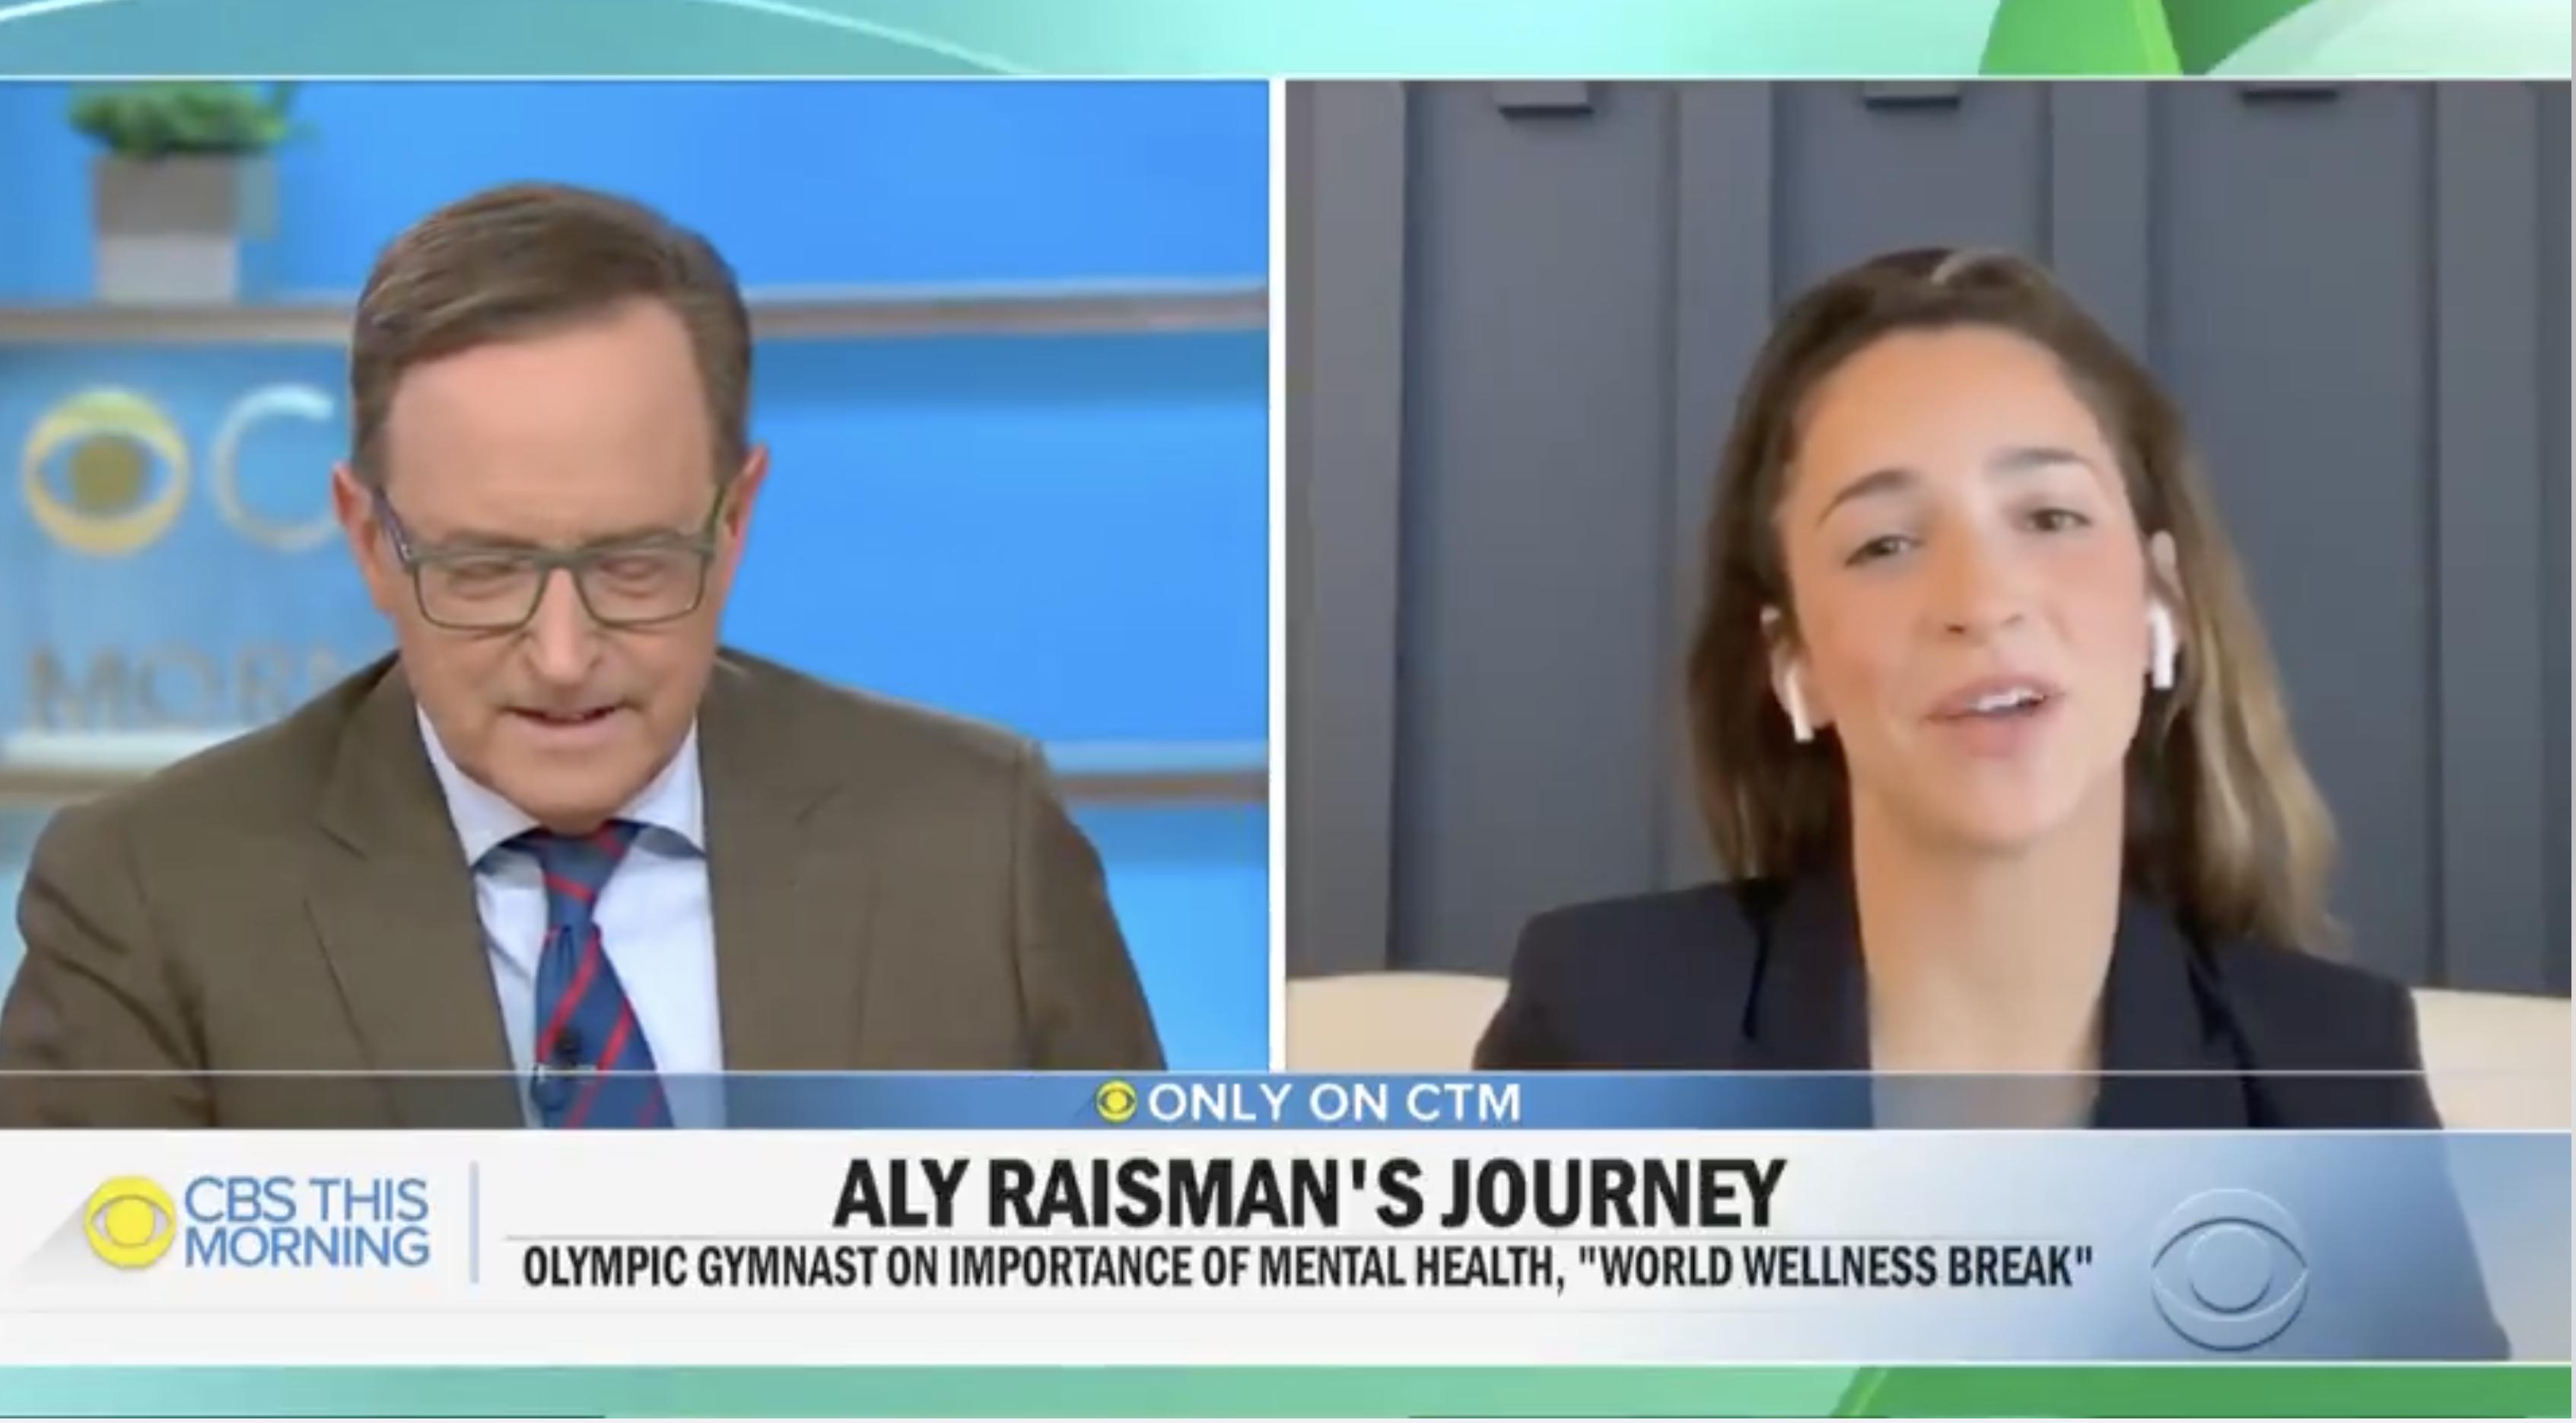 Gymnast Aly Raisman on Wellness Journey and Importance of Mental Health (Clone)